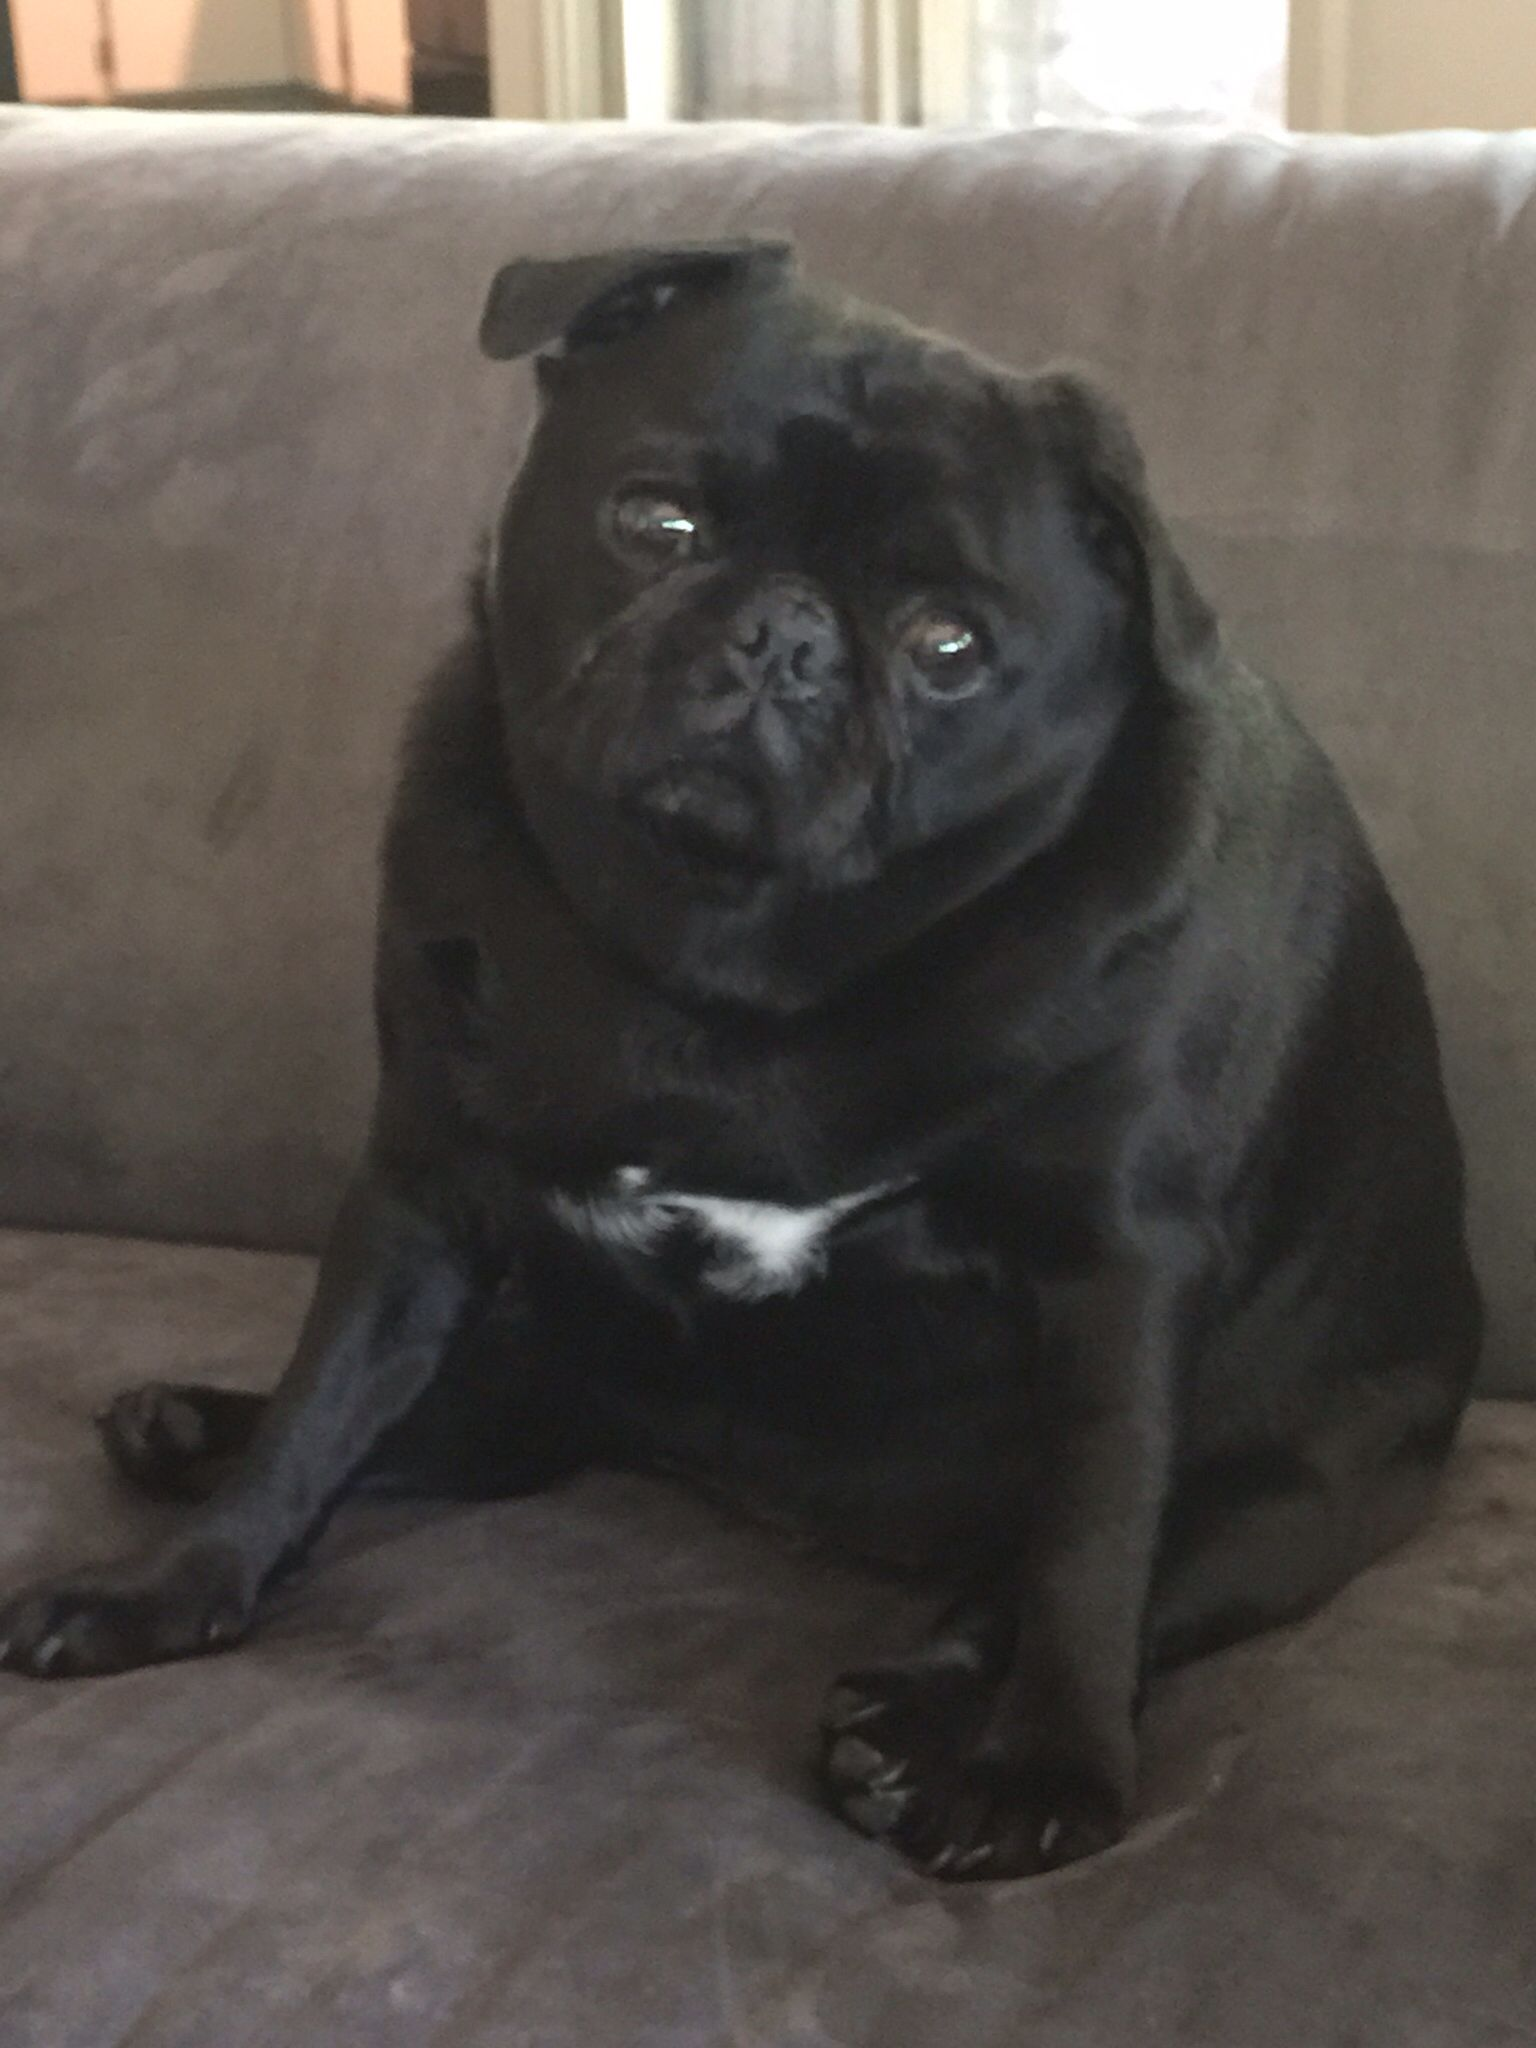 Download Black Chubby Adorable Dog - 66396040c30f57f48e6b721482fa0213  Collection_28985  .jpg